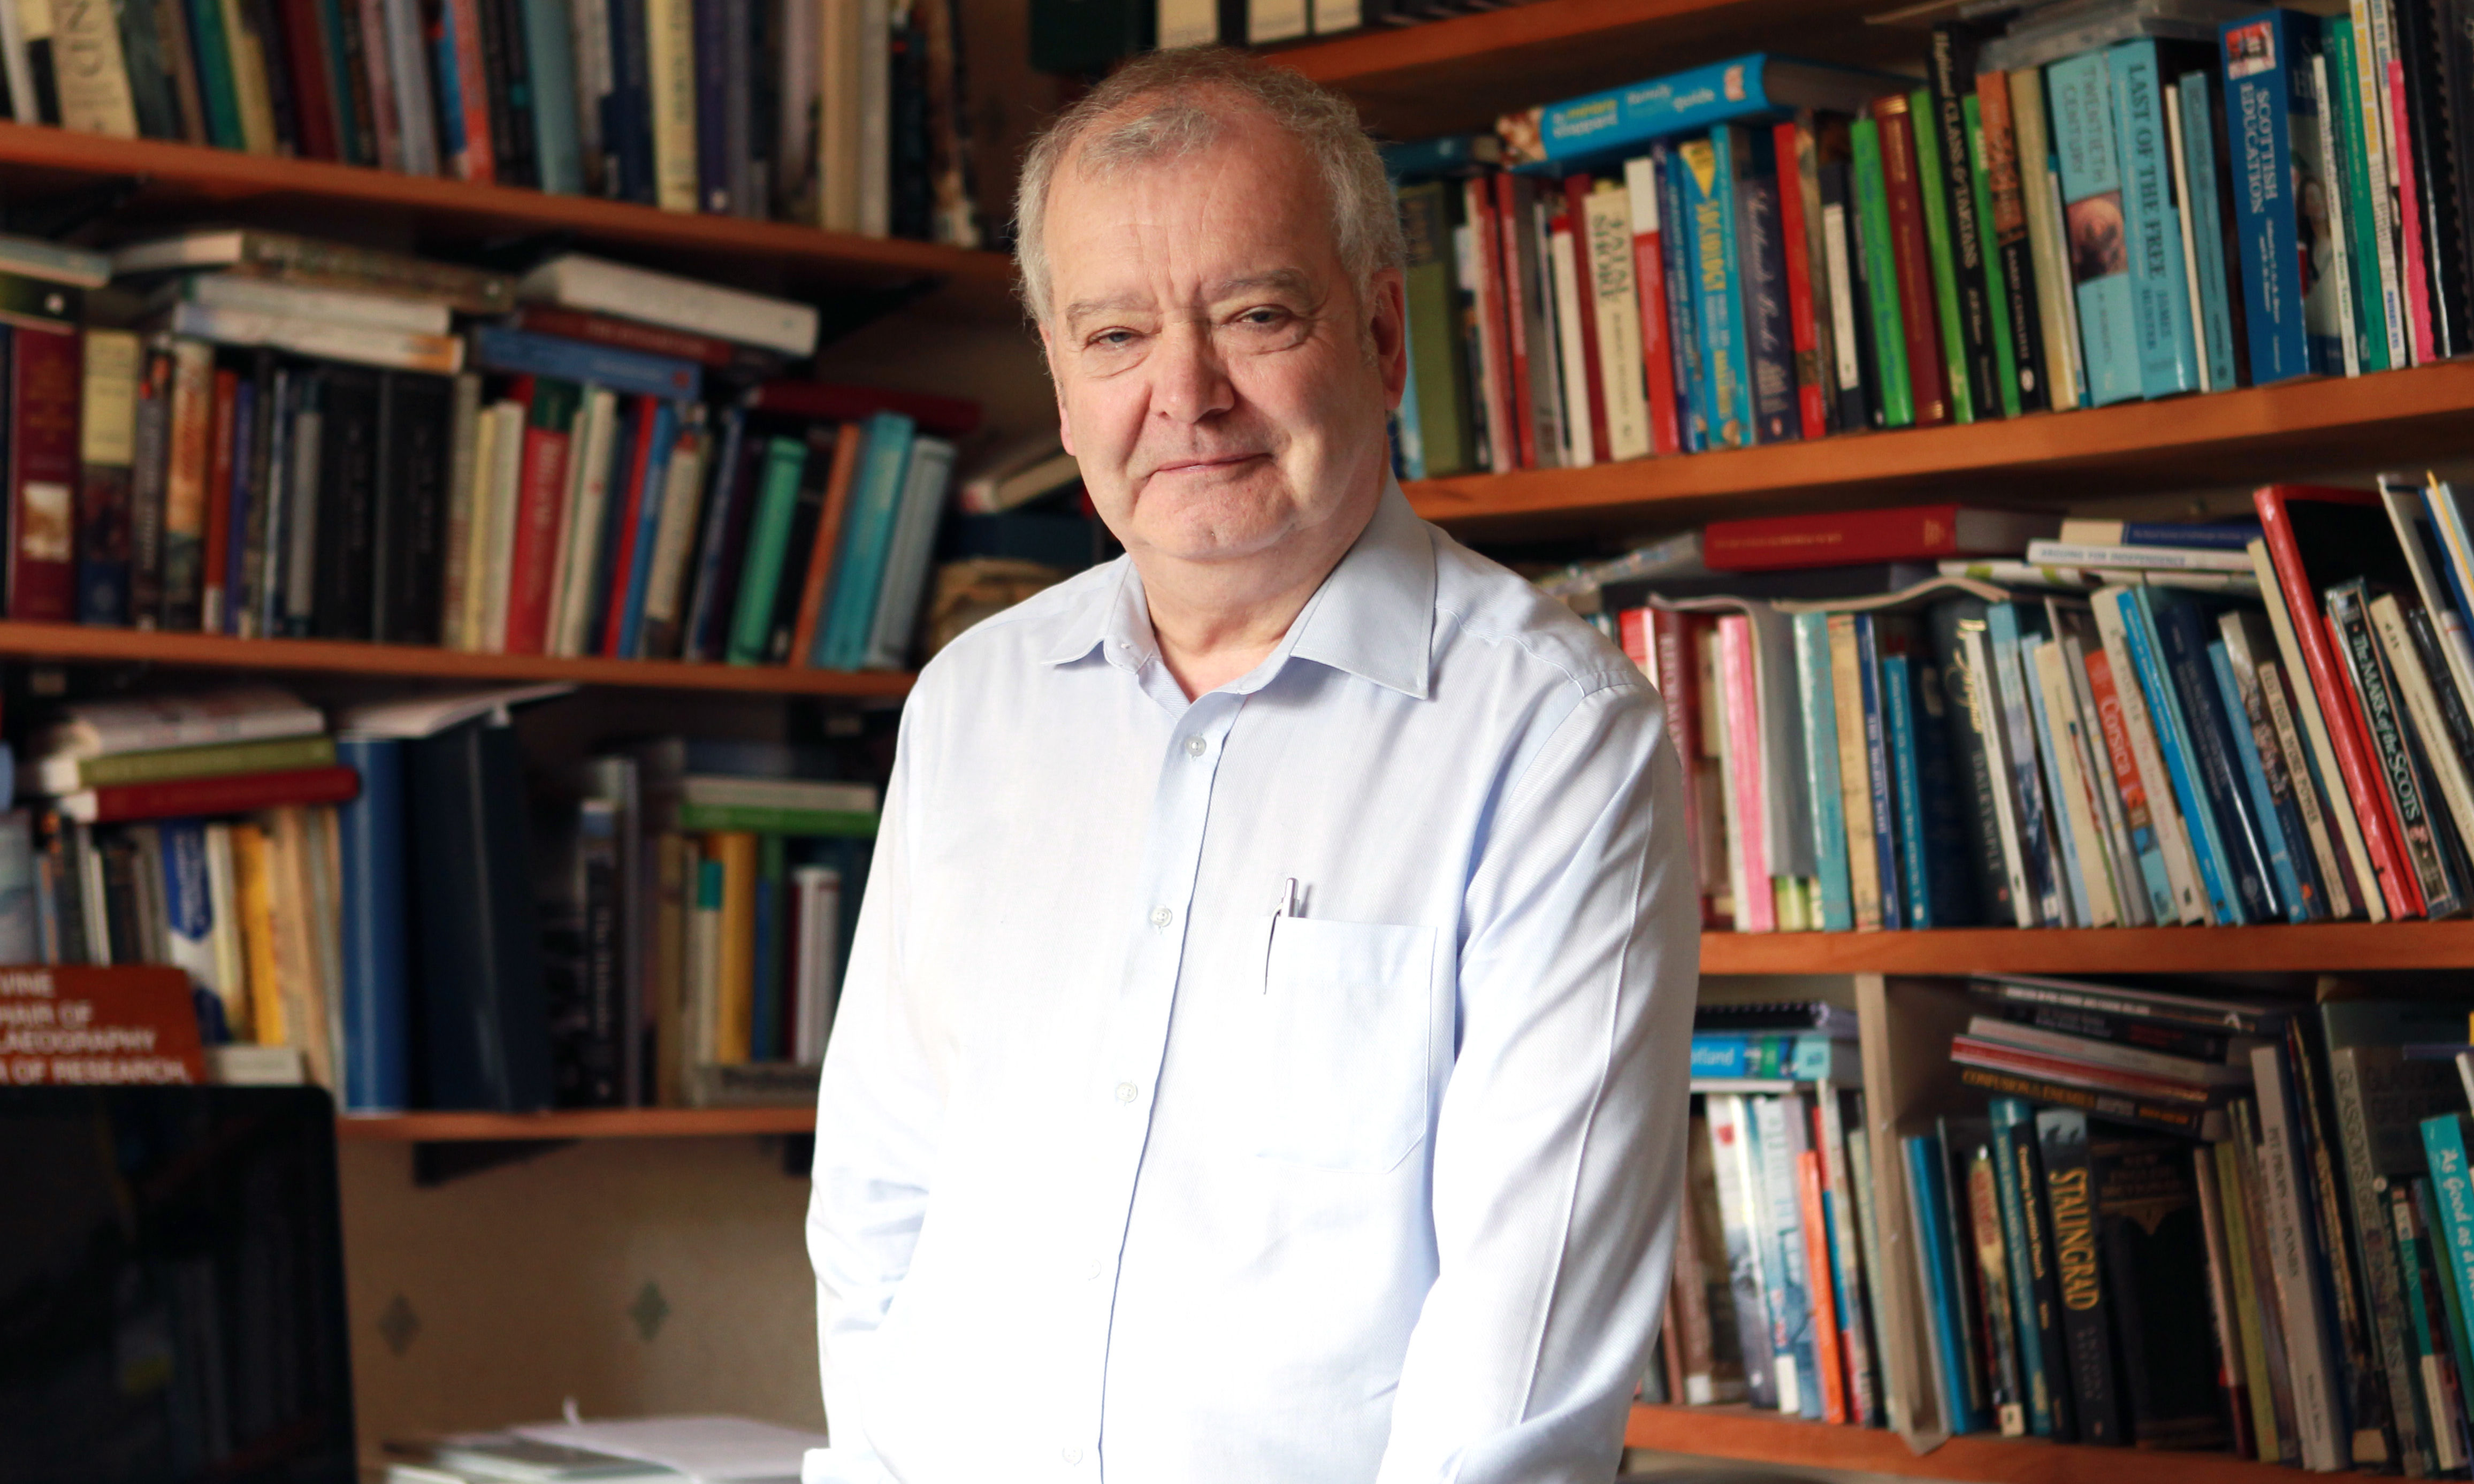 Professor Sir Tom Devine at his home.